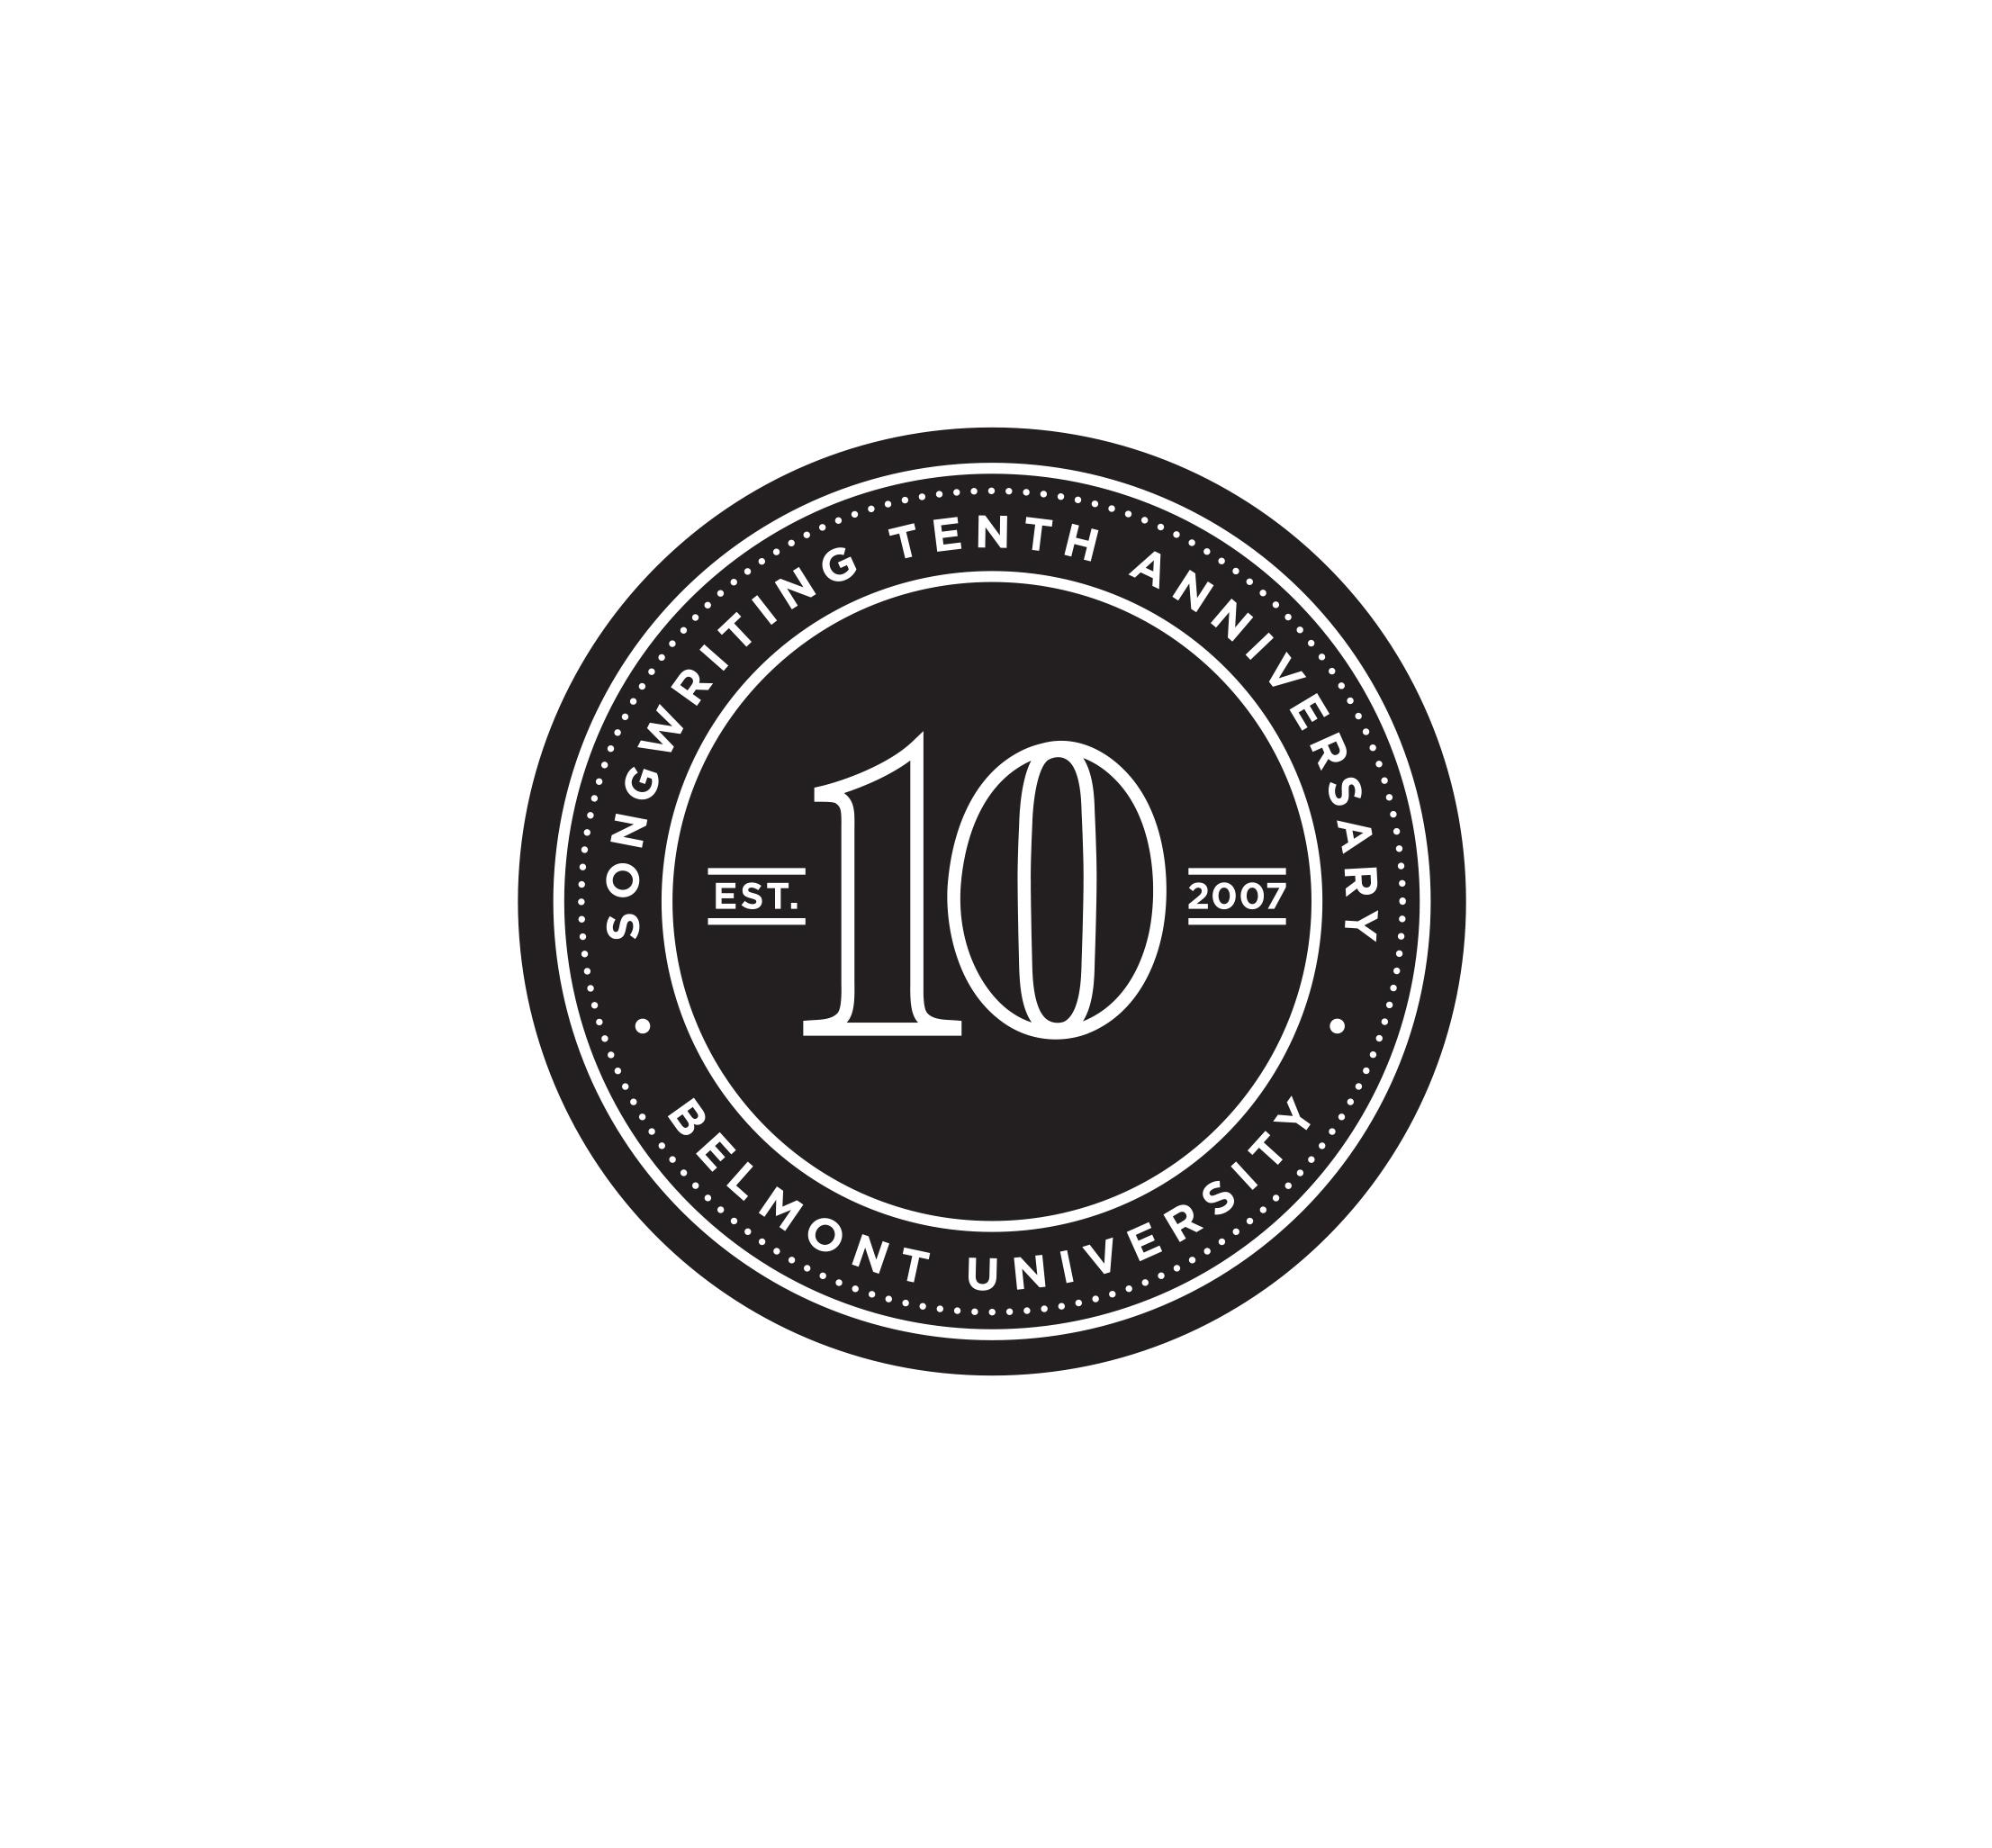 CEMB-171189 Songwriting 10th Anniversary Seal_v3.jpg